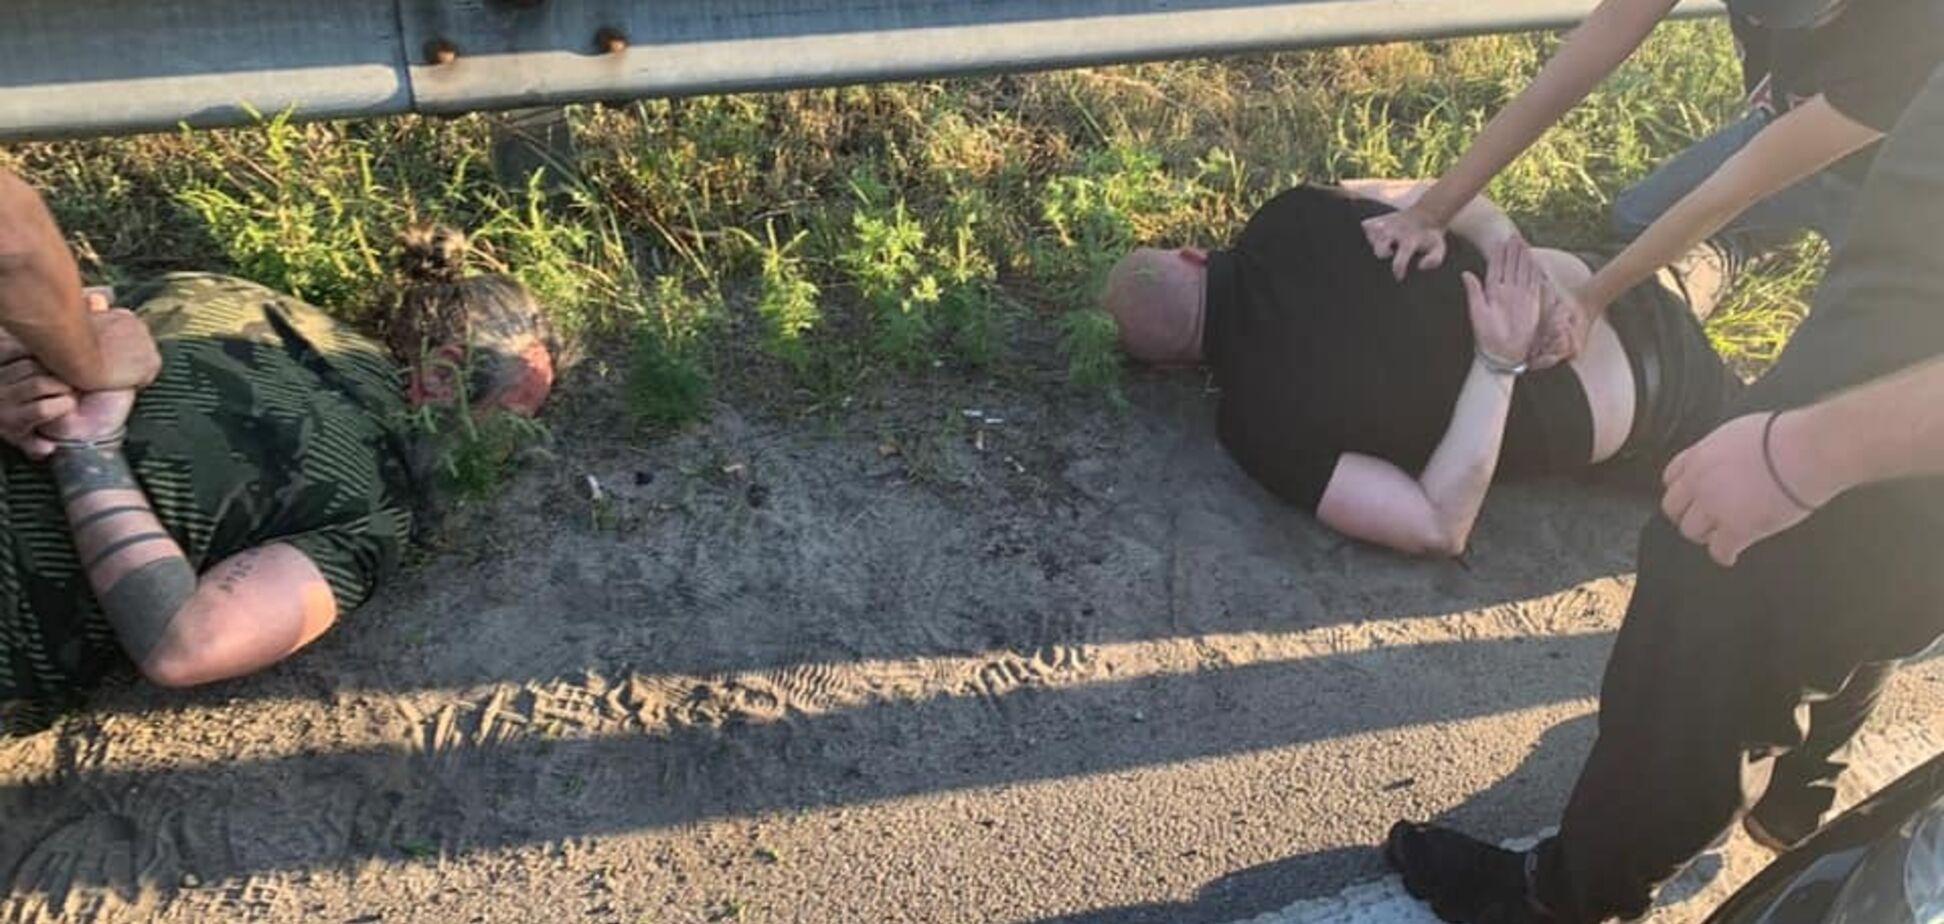 'Молниеносное задержание!' На Киевщине спецназ поймал банду иностранцев. Видео